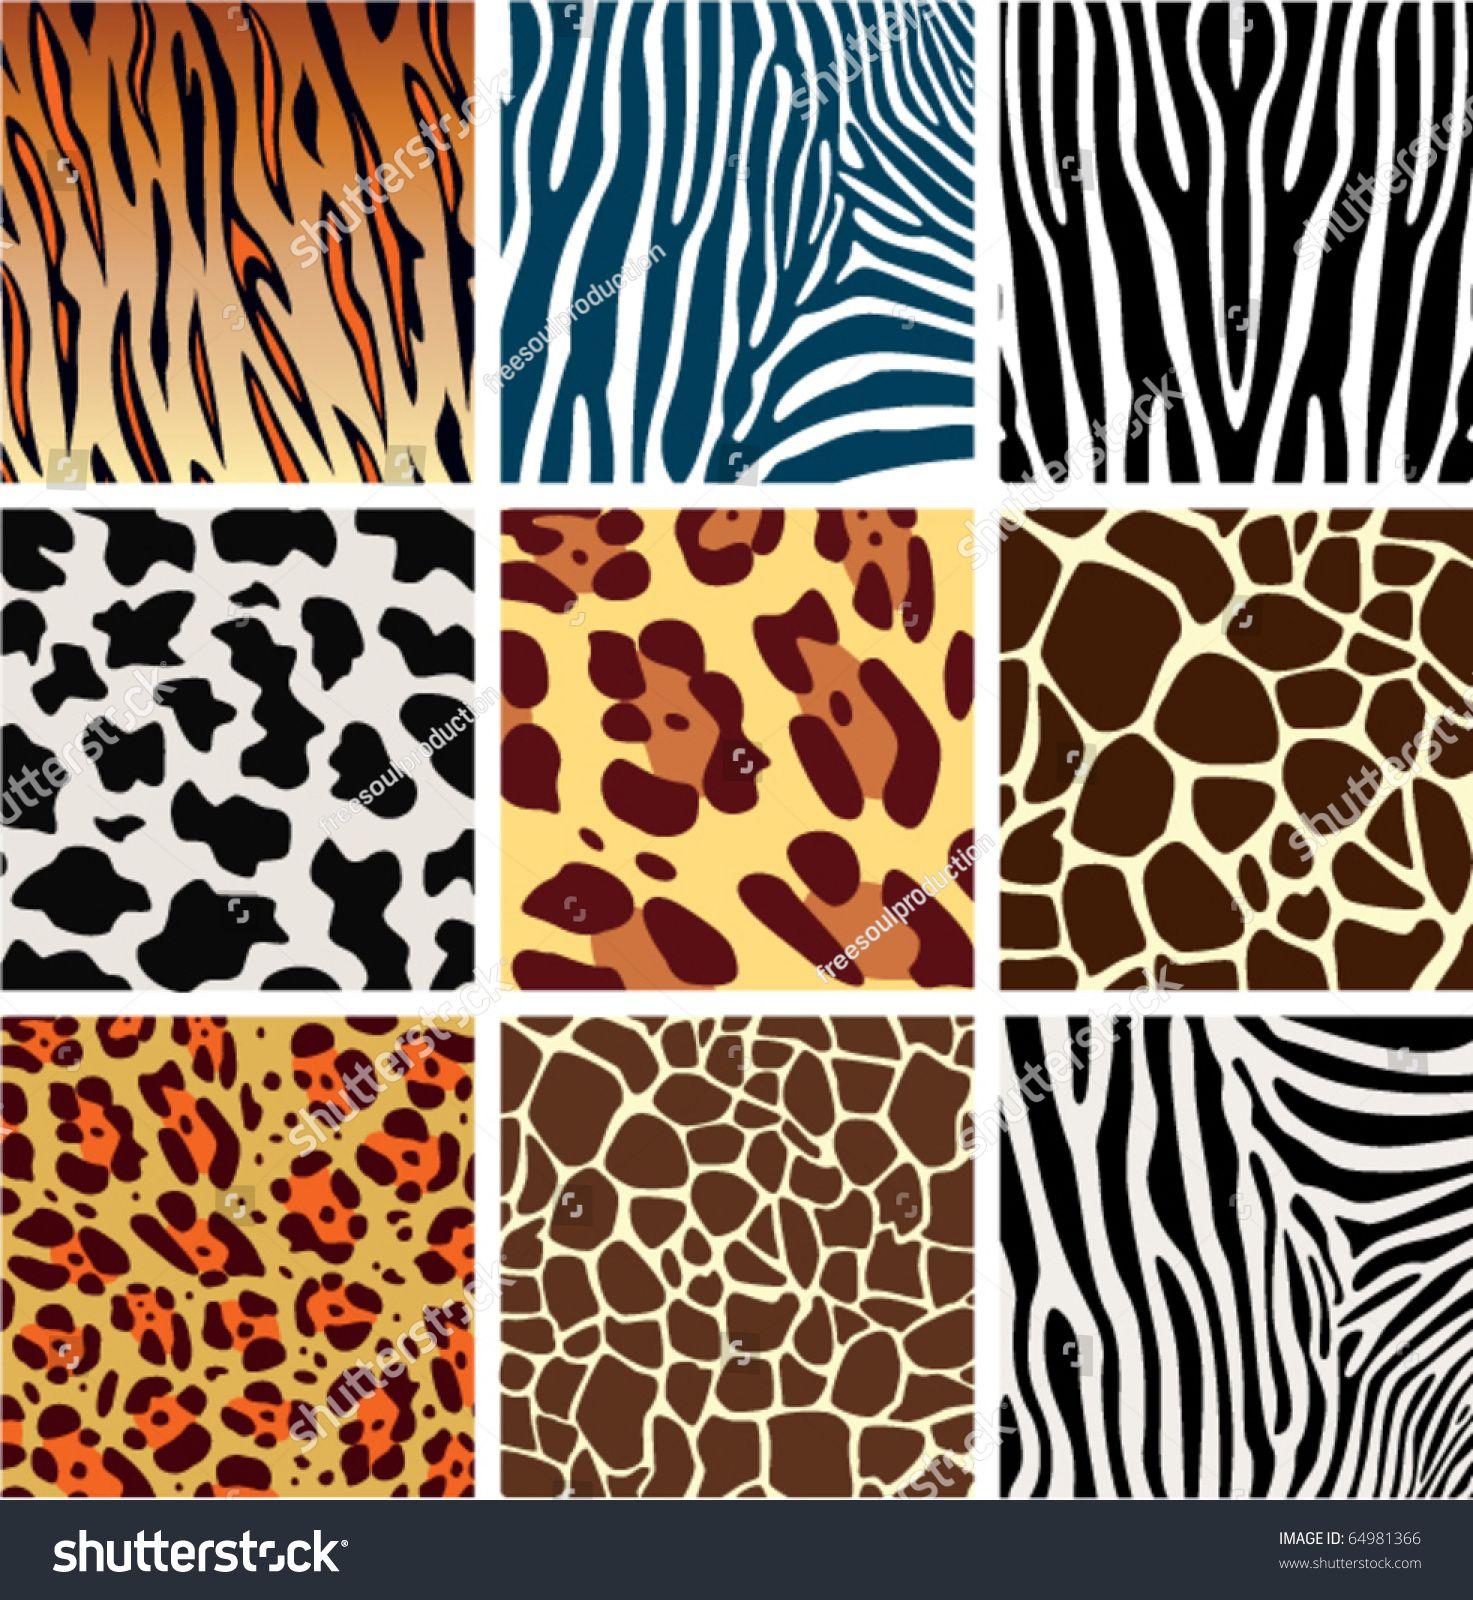 Vector Animal Skin Textures Of Tiger Zebra Giraffe Leopard And Cow Animals Print Background Pattern For Fa Animal Print Background Animal Print Animal Skin